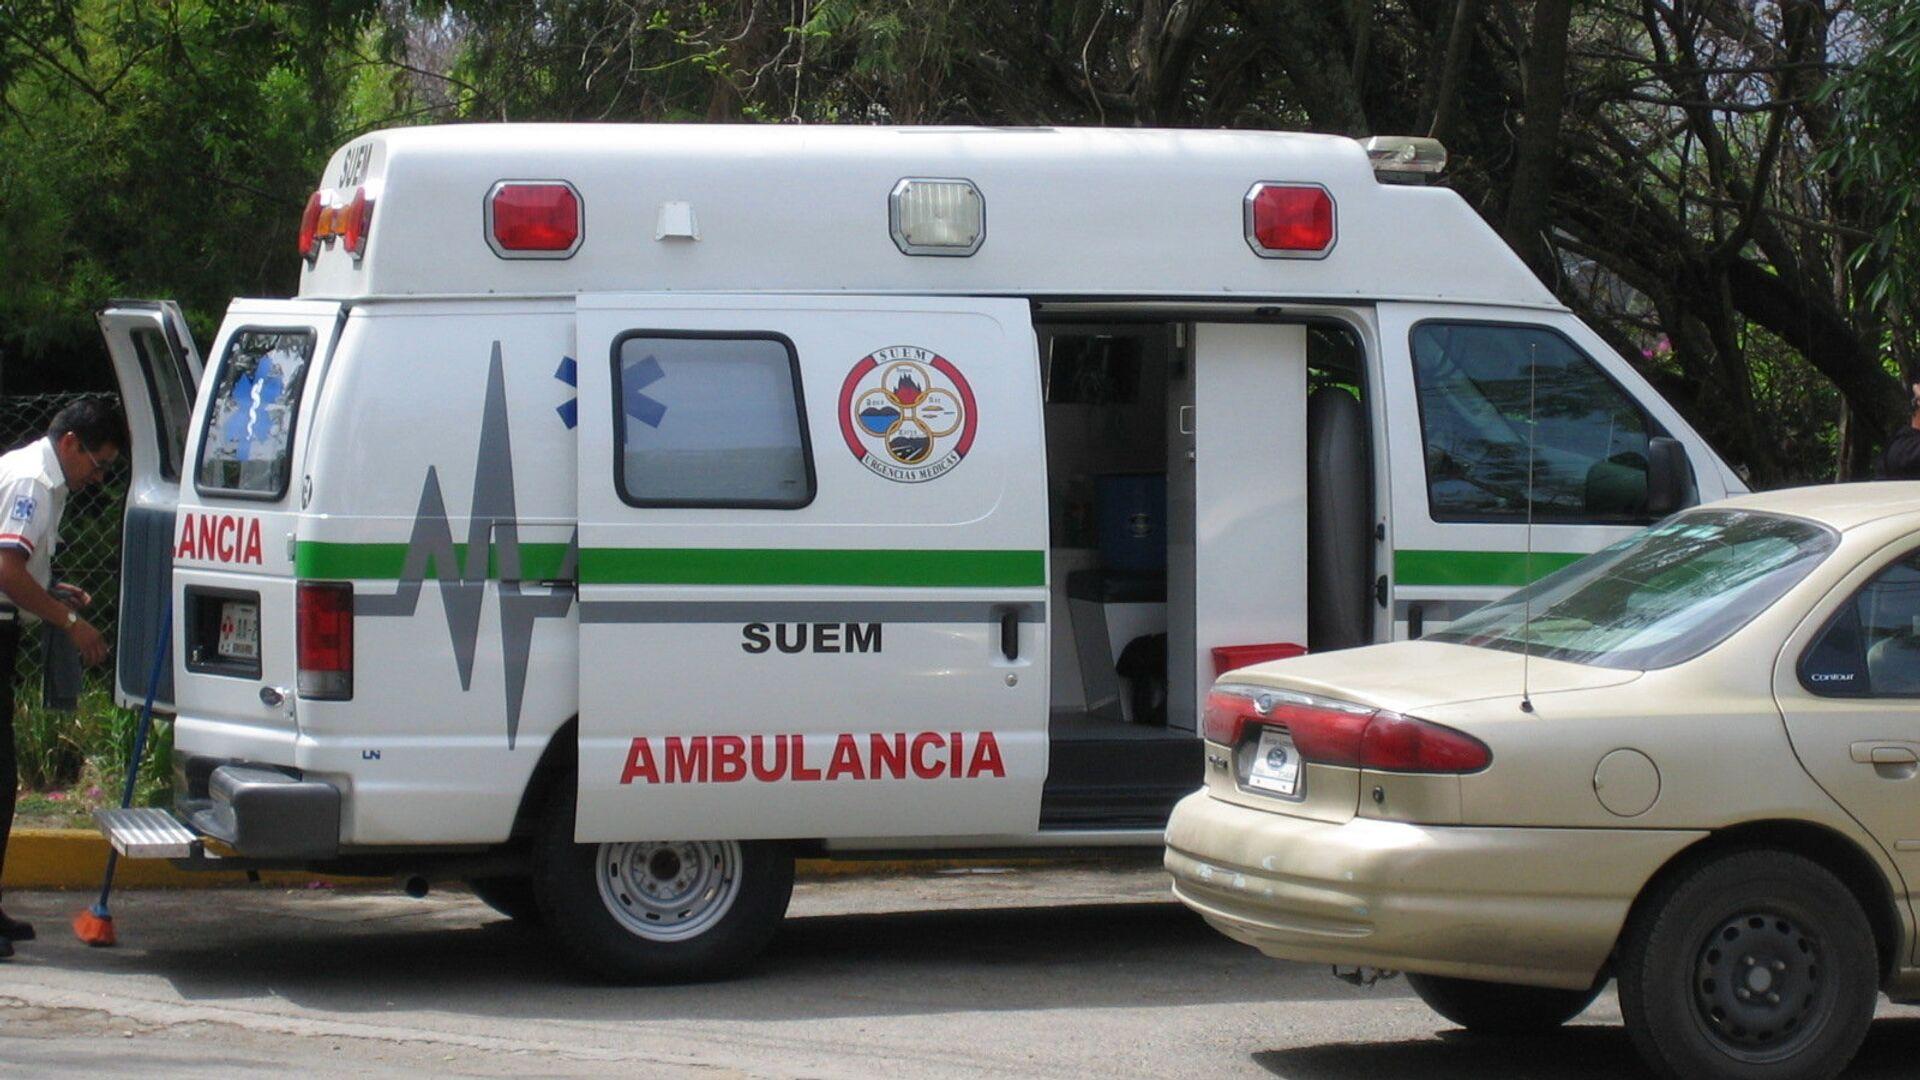 Ambulancia mexicana (archivo) - Sputnik Mundo, 1920, 28.03.2021